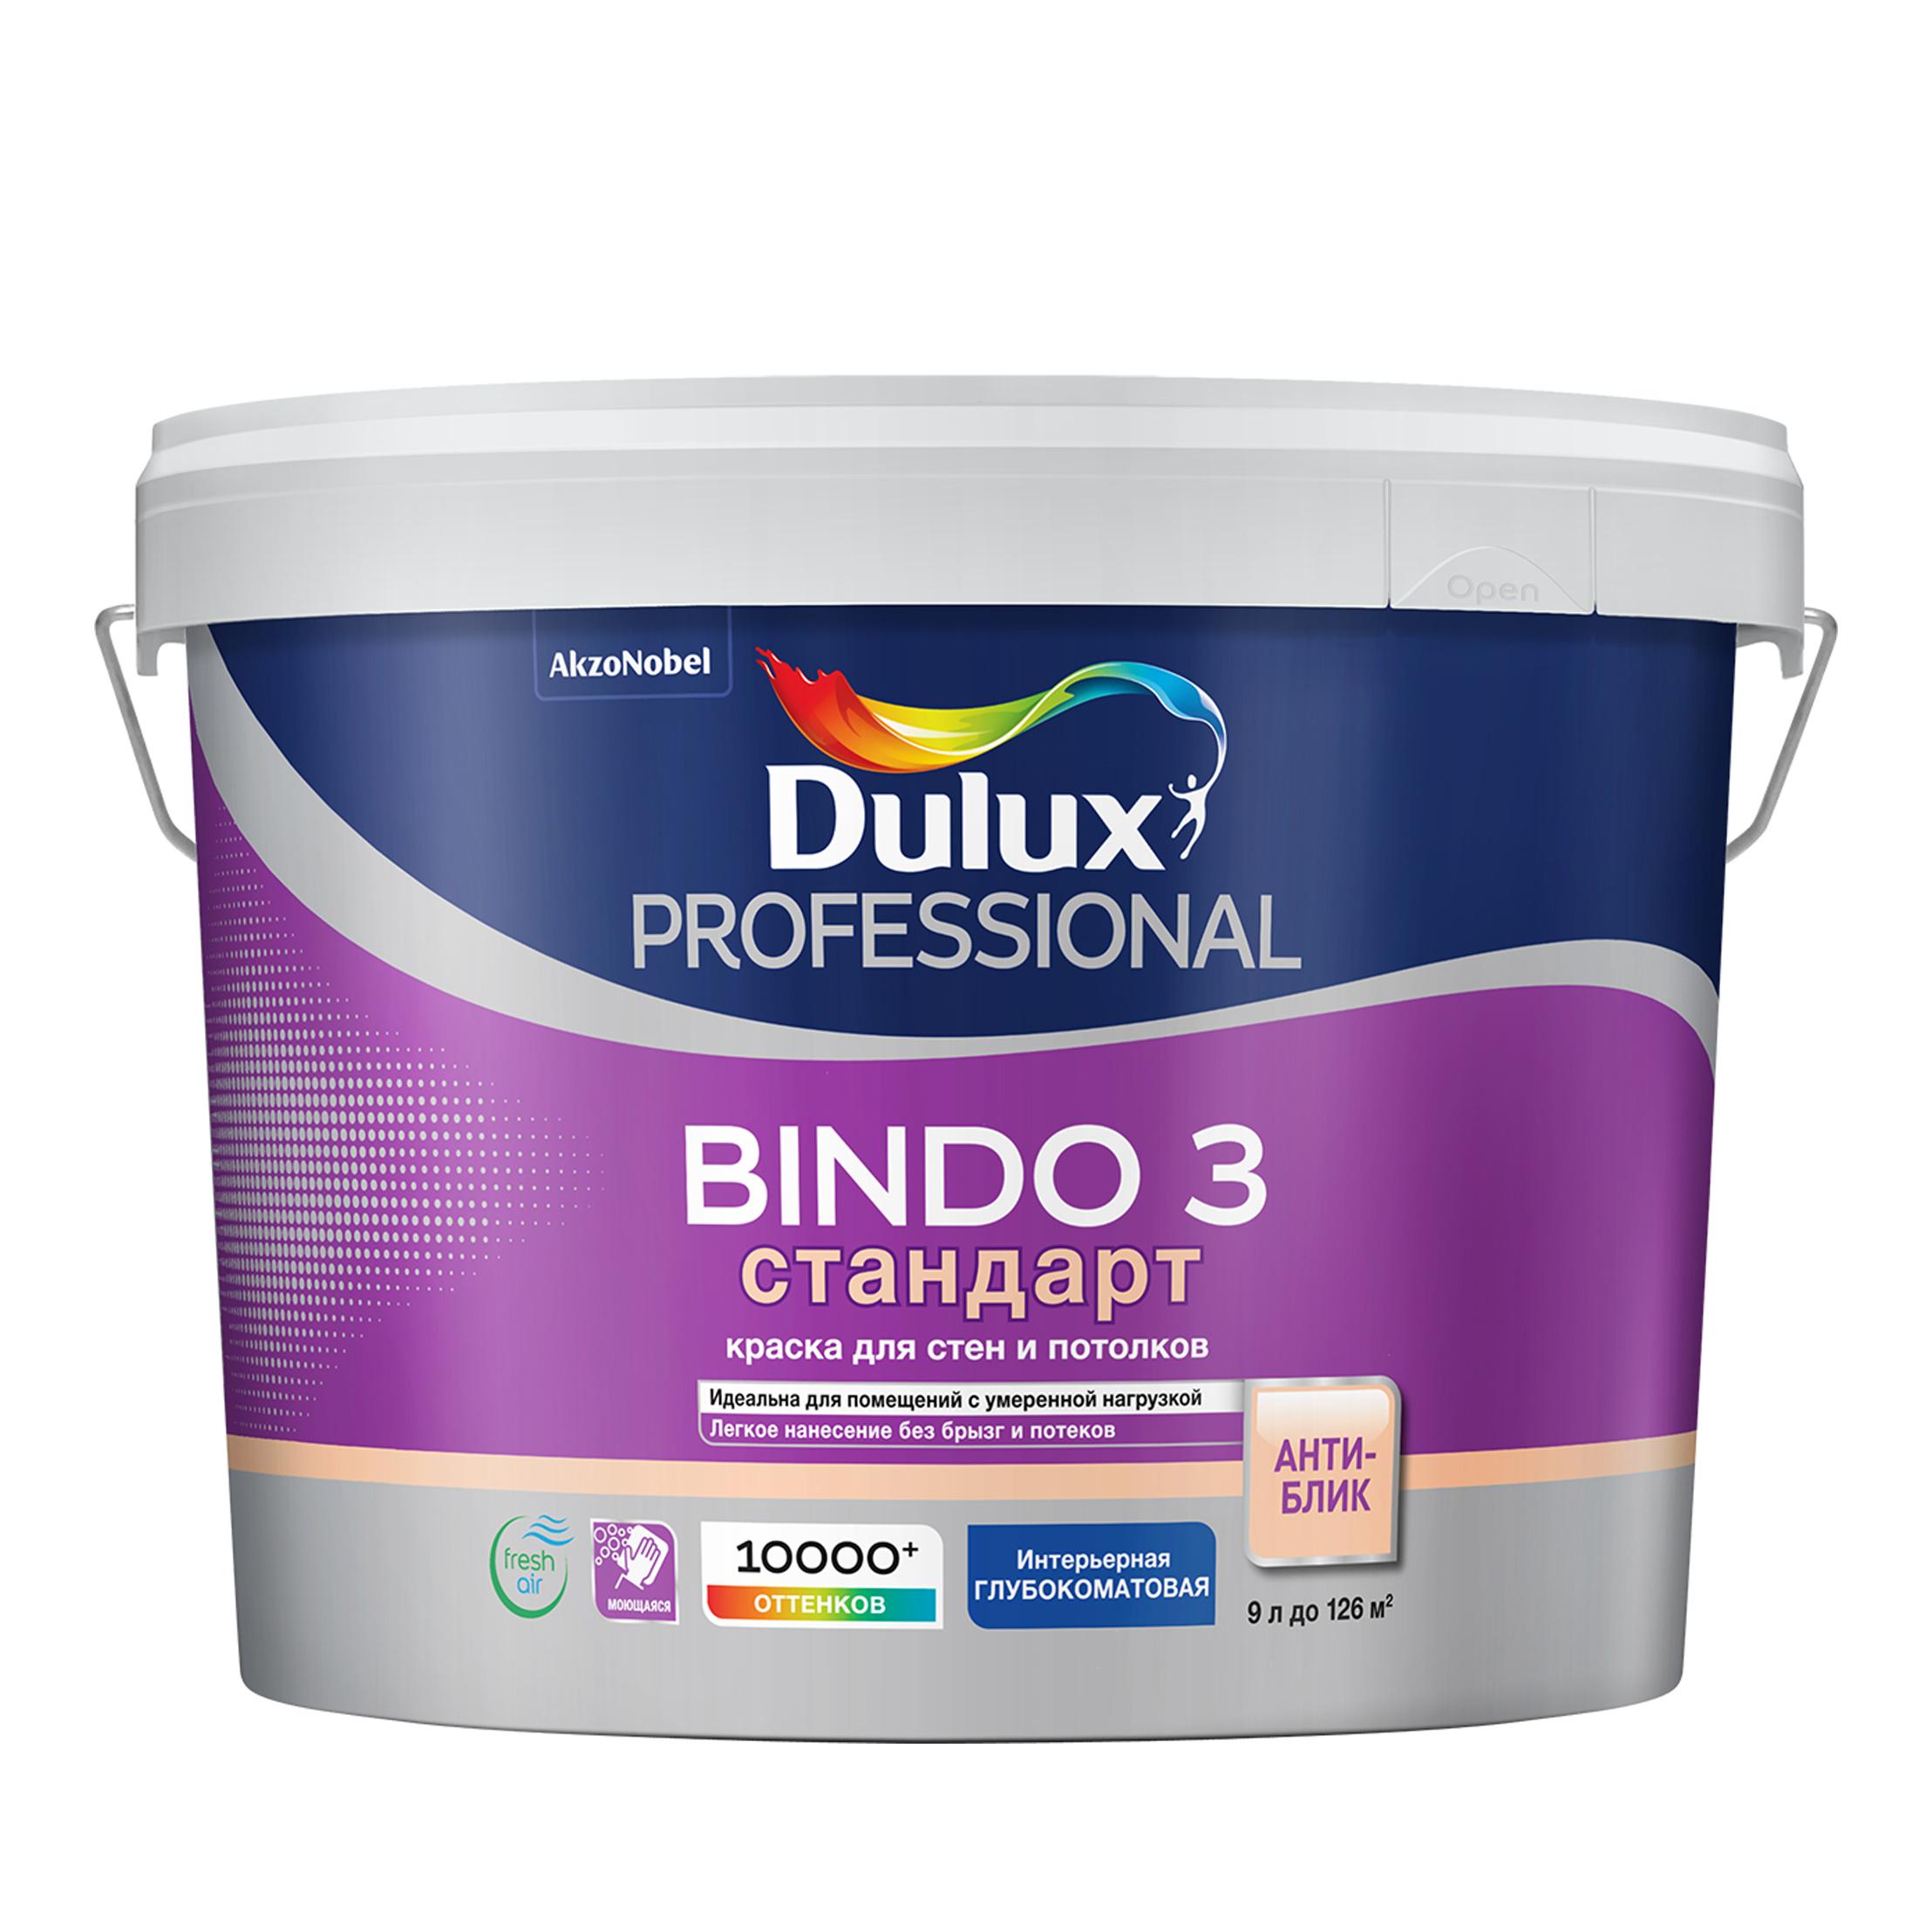 Краска для стен и потолков латексная Dulux Professional Bindo 3 глубокоматовая база BW 9 л.